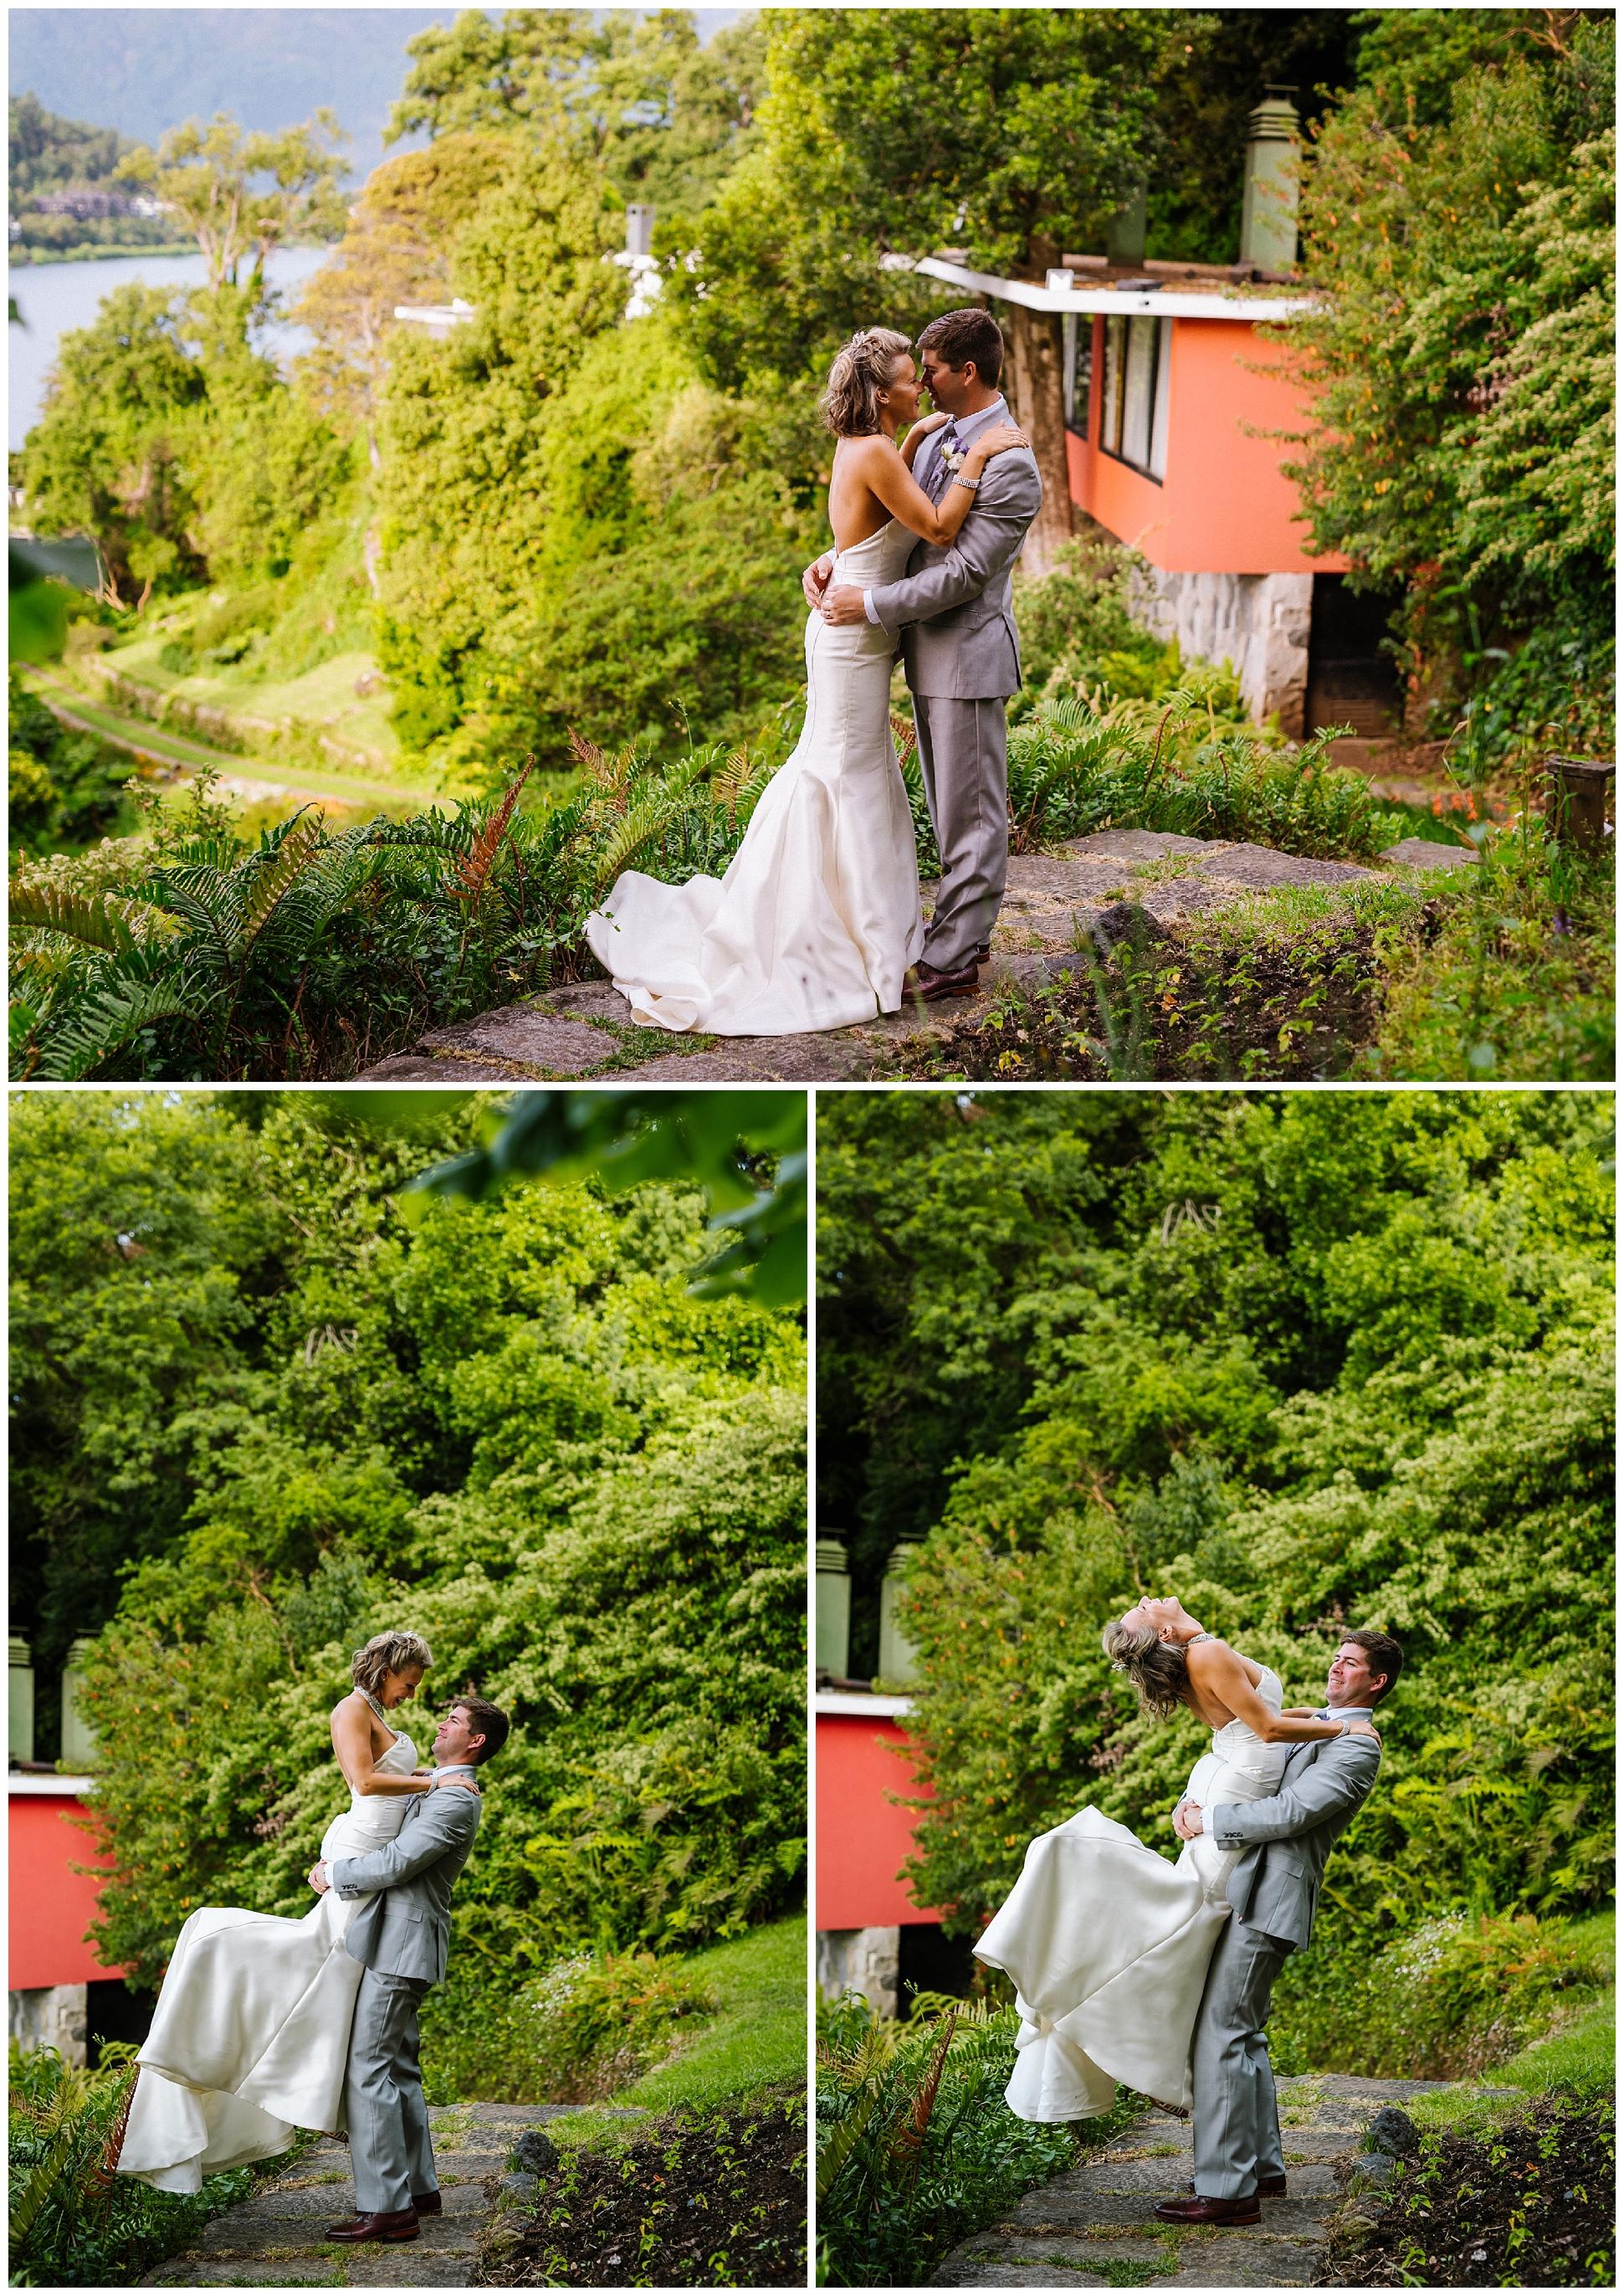 Cheilean-destination-adventure-wedding-florida-patagonia-pucon-santa-cruz-vsco_0124.jpg